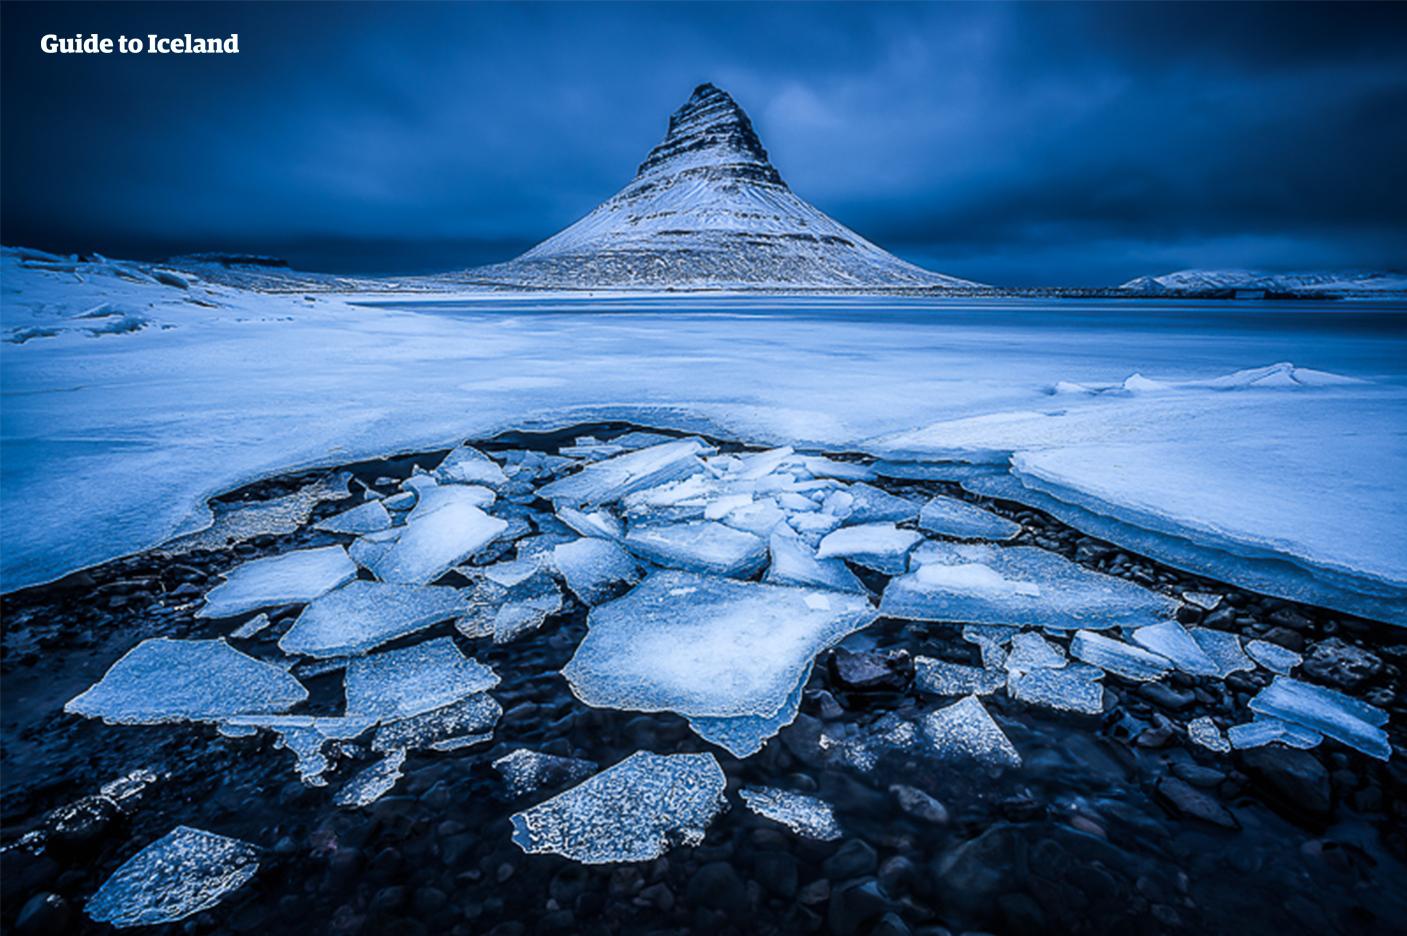 Der frostige Anblick des Berges Kirkjufell auf der Halbinsel Snæfellsnes.